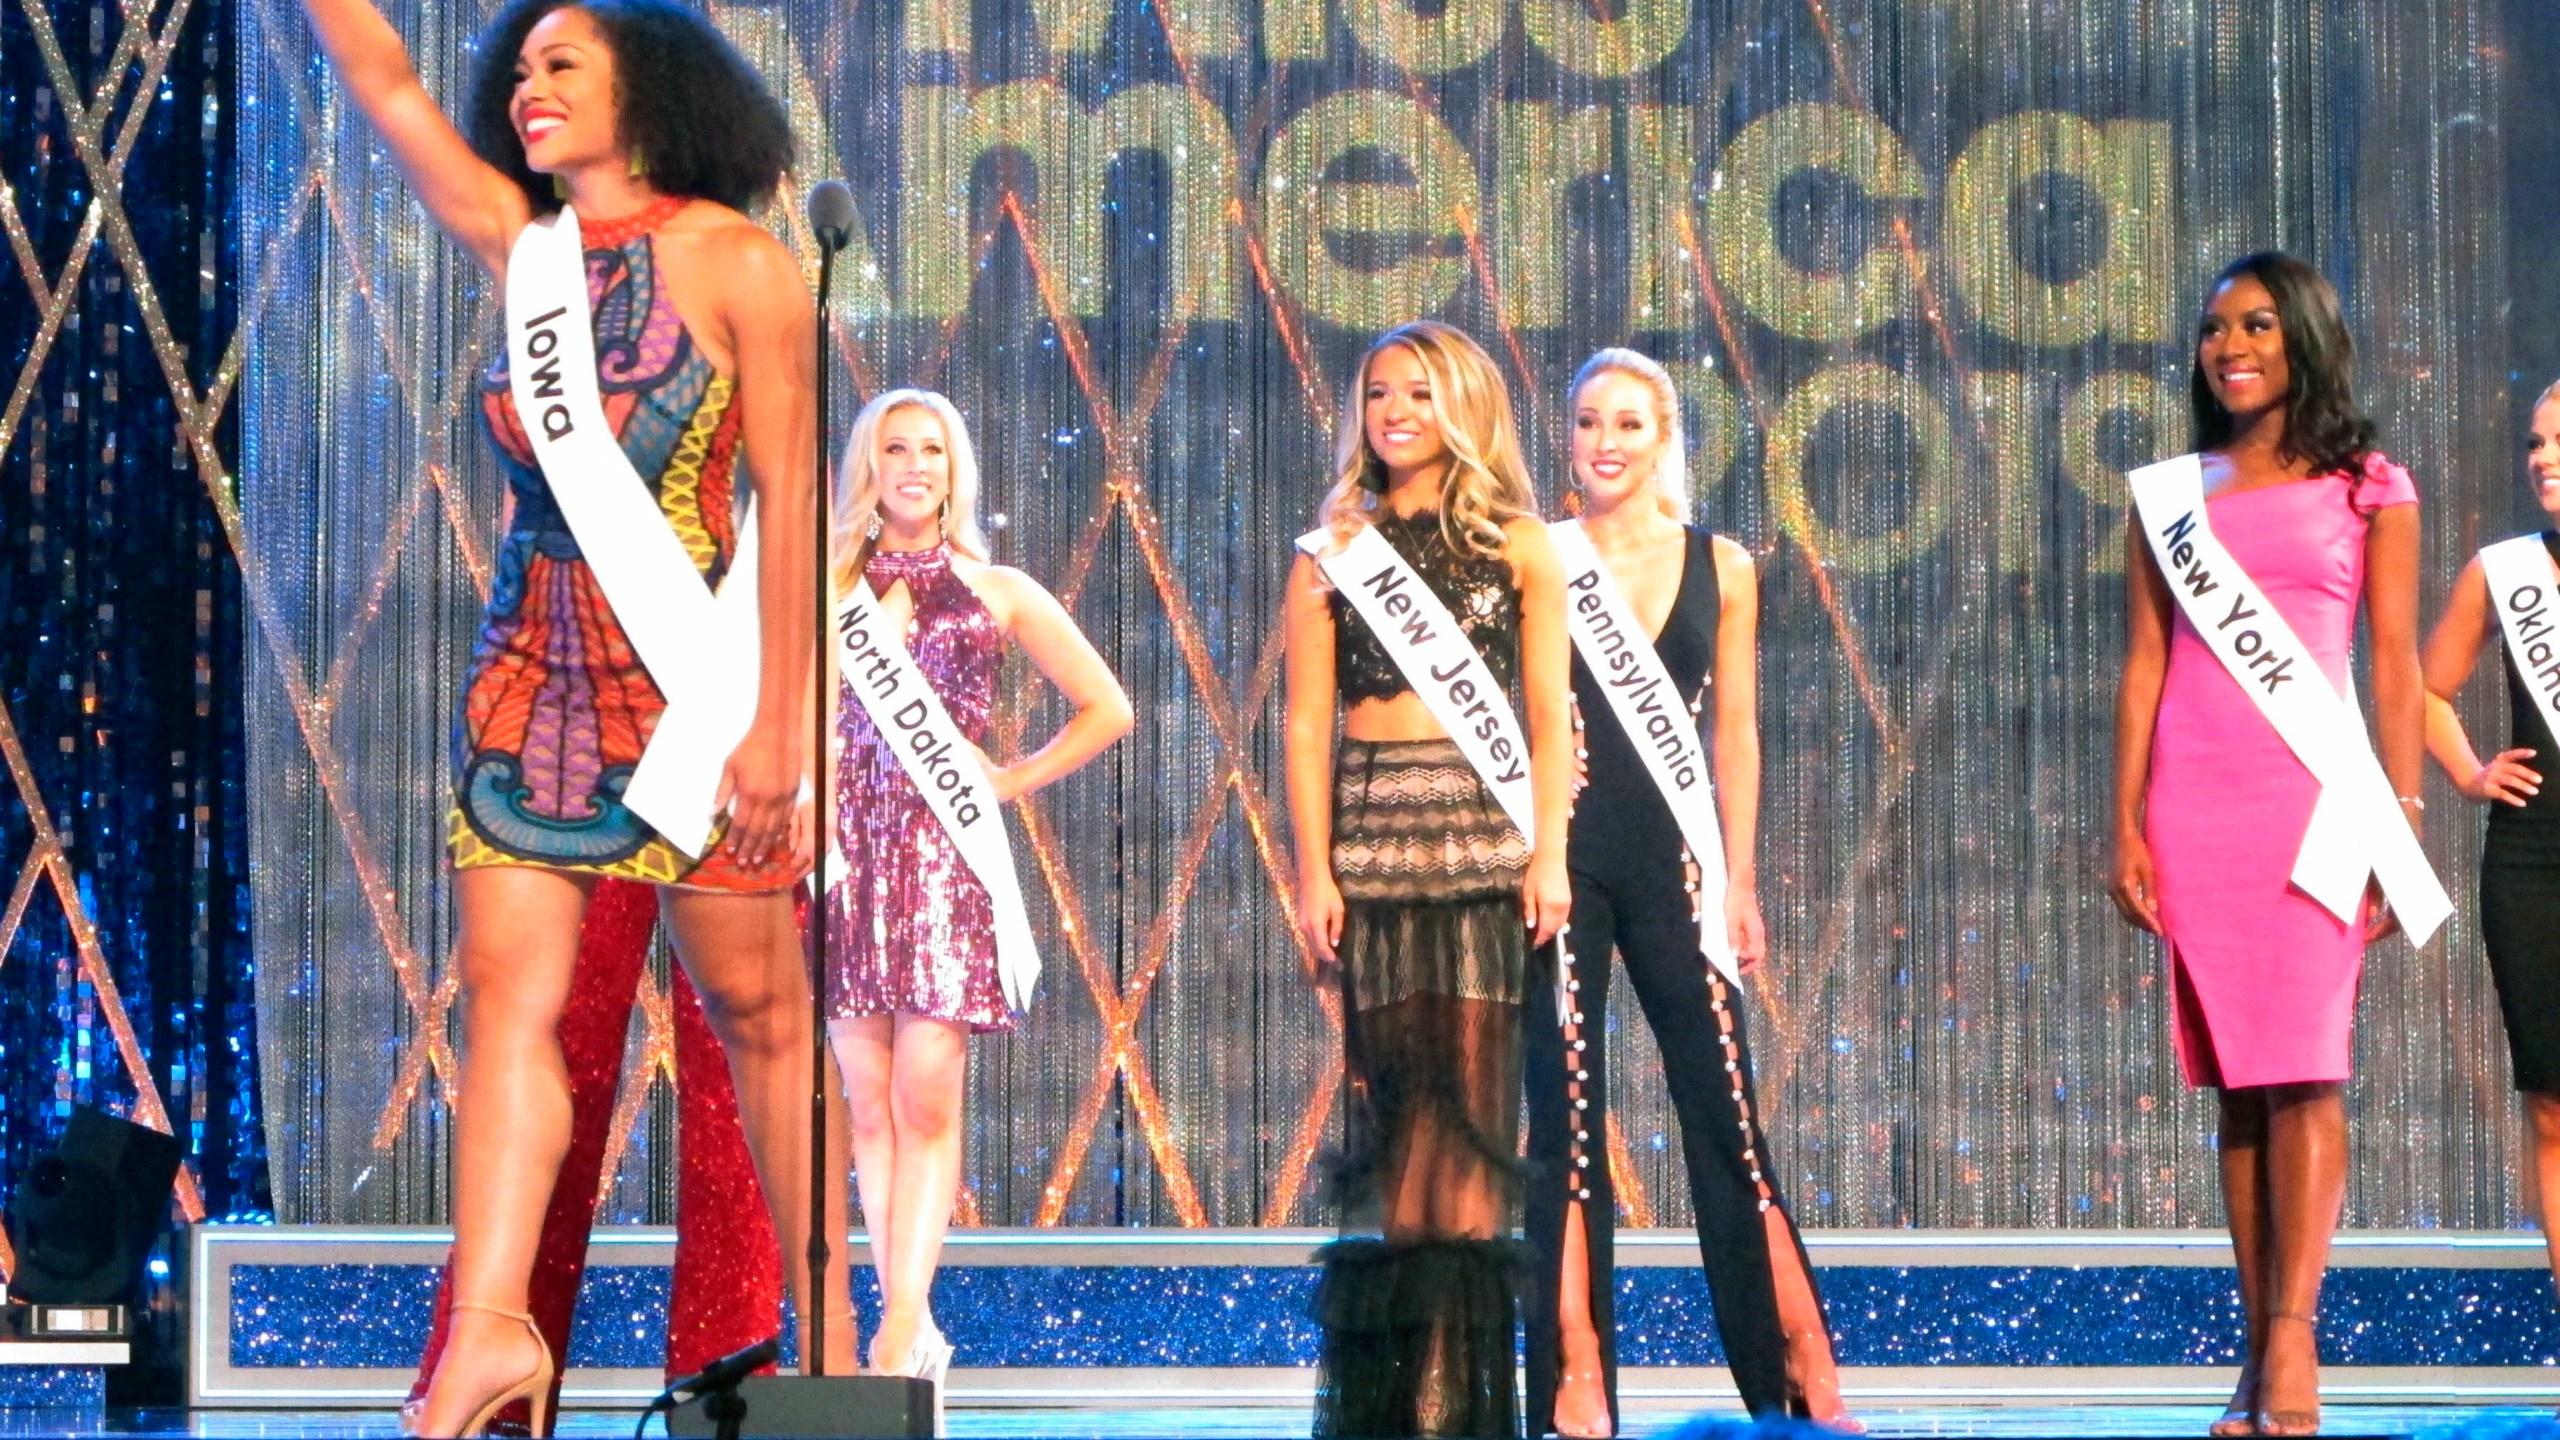 Miss_America_20111-159532.jpg33843652